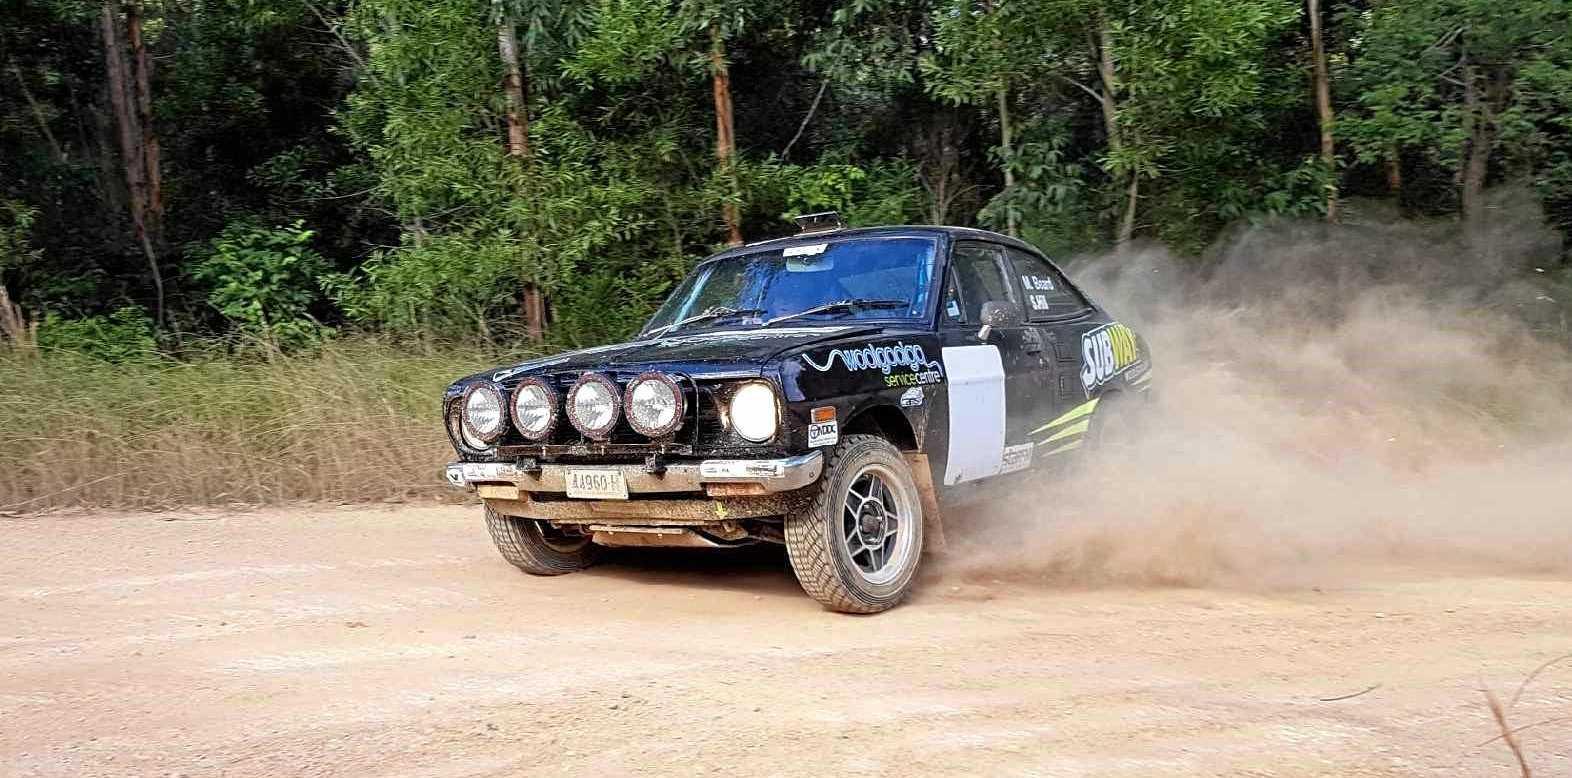 Woolgoolga rally driver Mark Beard test drives his 1973 Datsun 1200 Coupe ahead of the AGL Rally Of The Heartland.